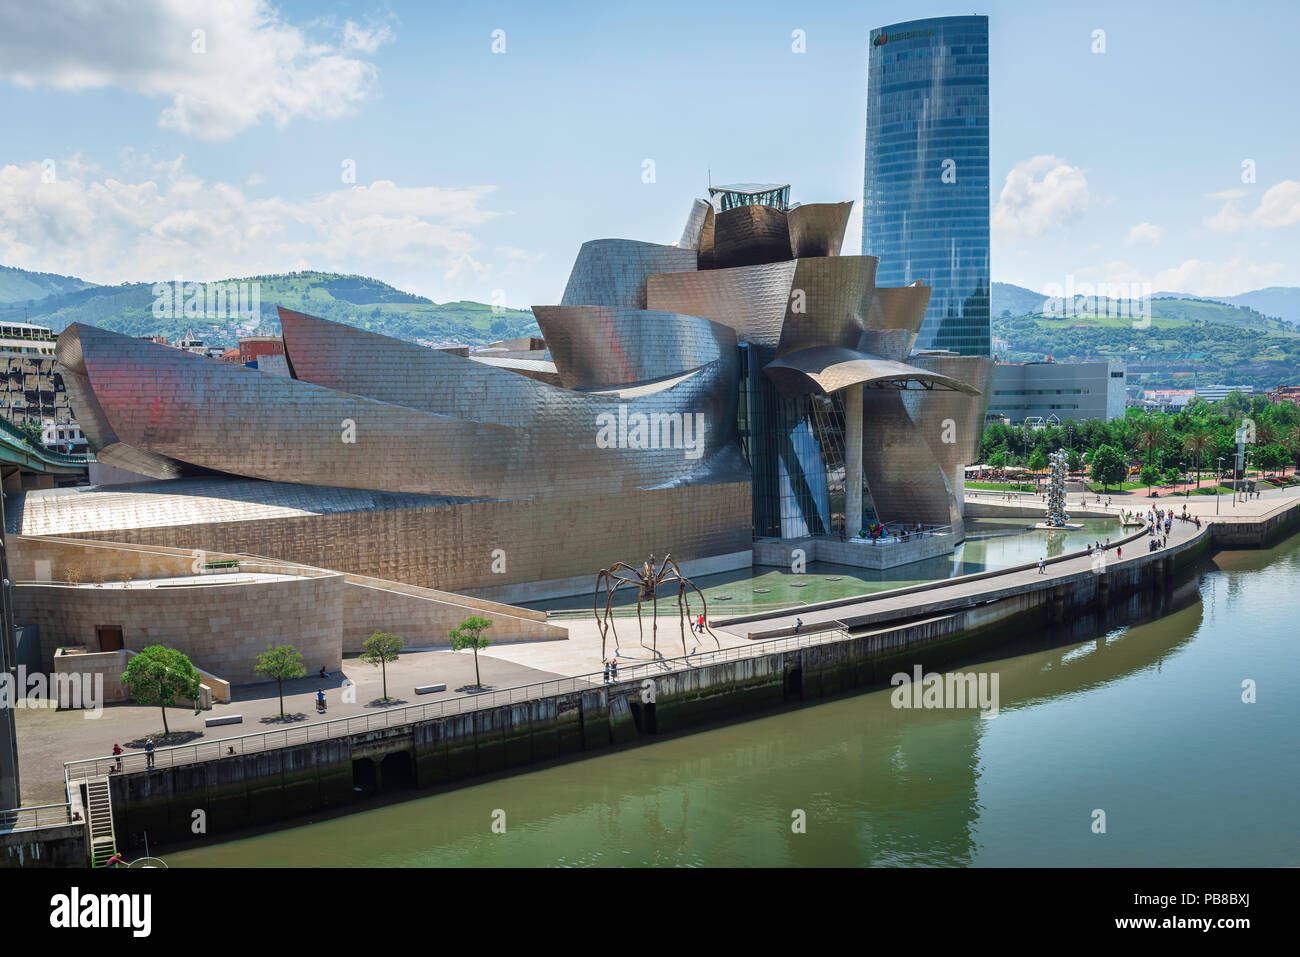 Guggenheim Museo.Bilbao Guggenheim Museum View Of The Frank Gehry Designed